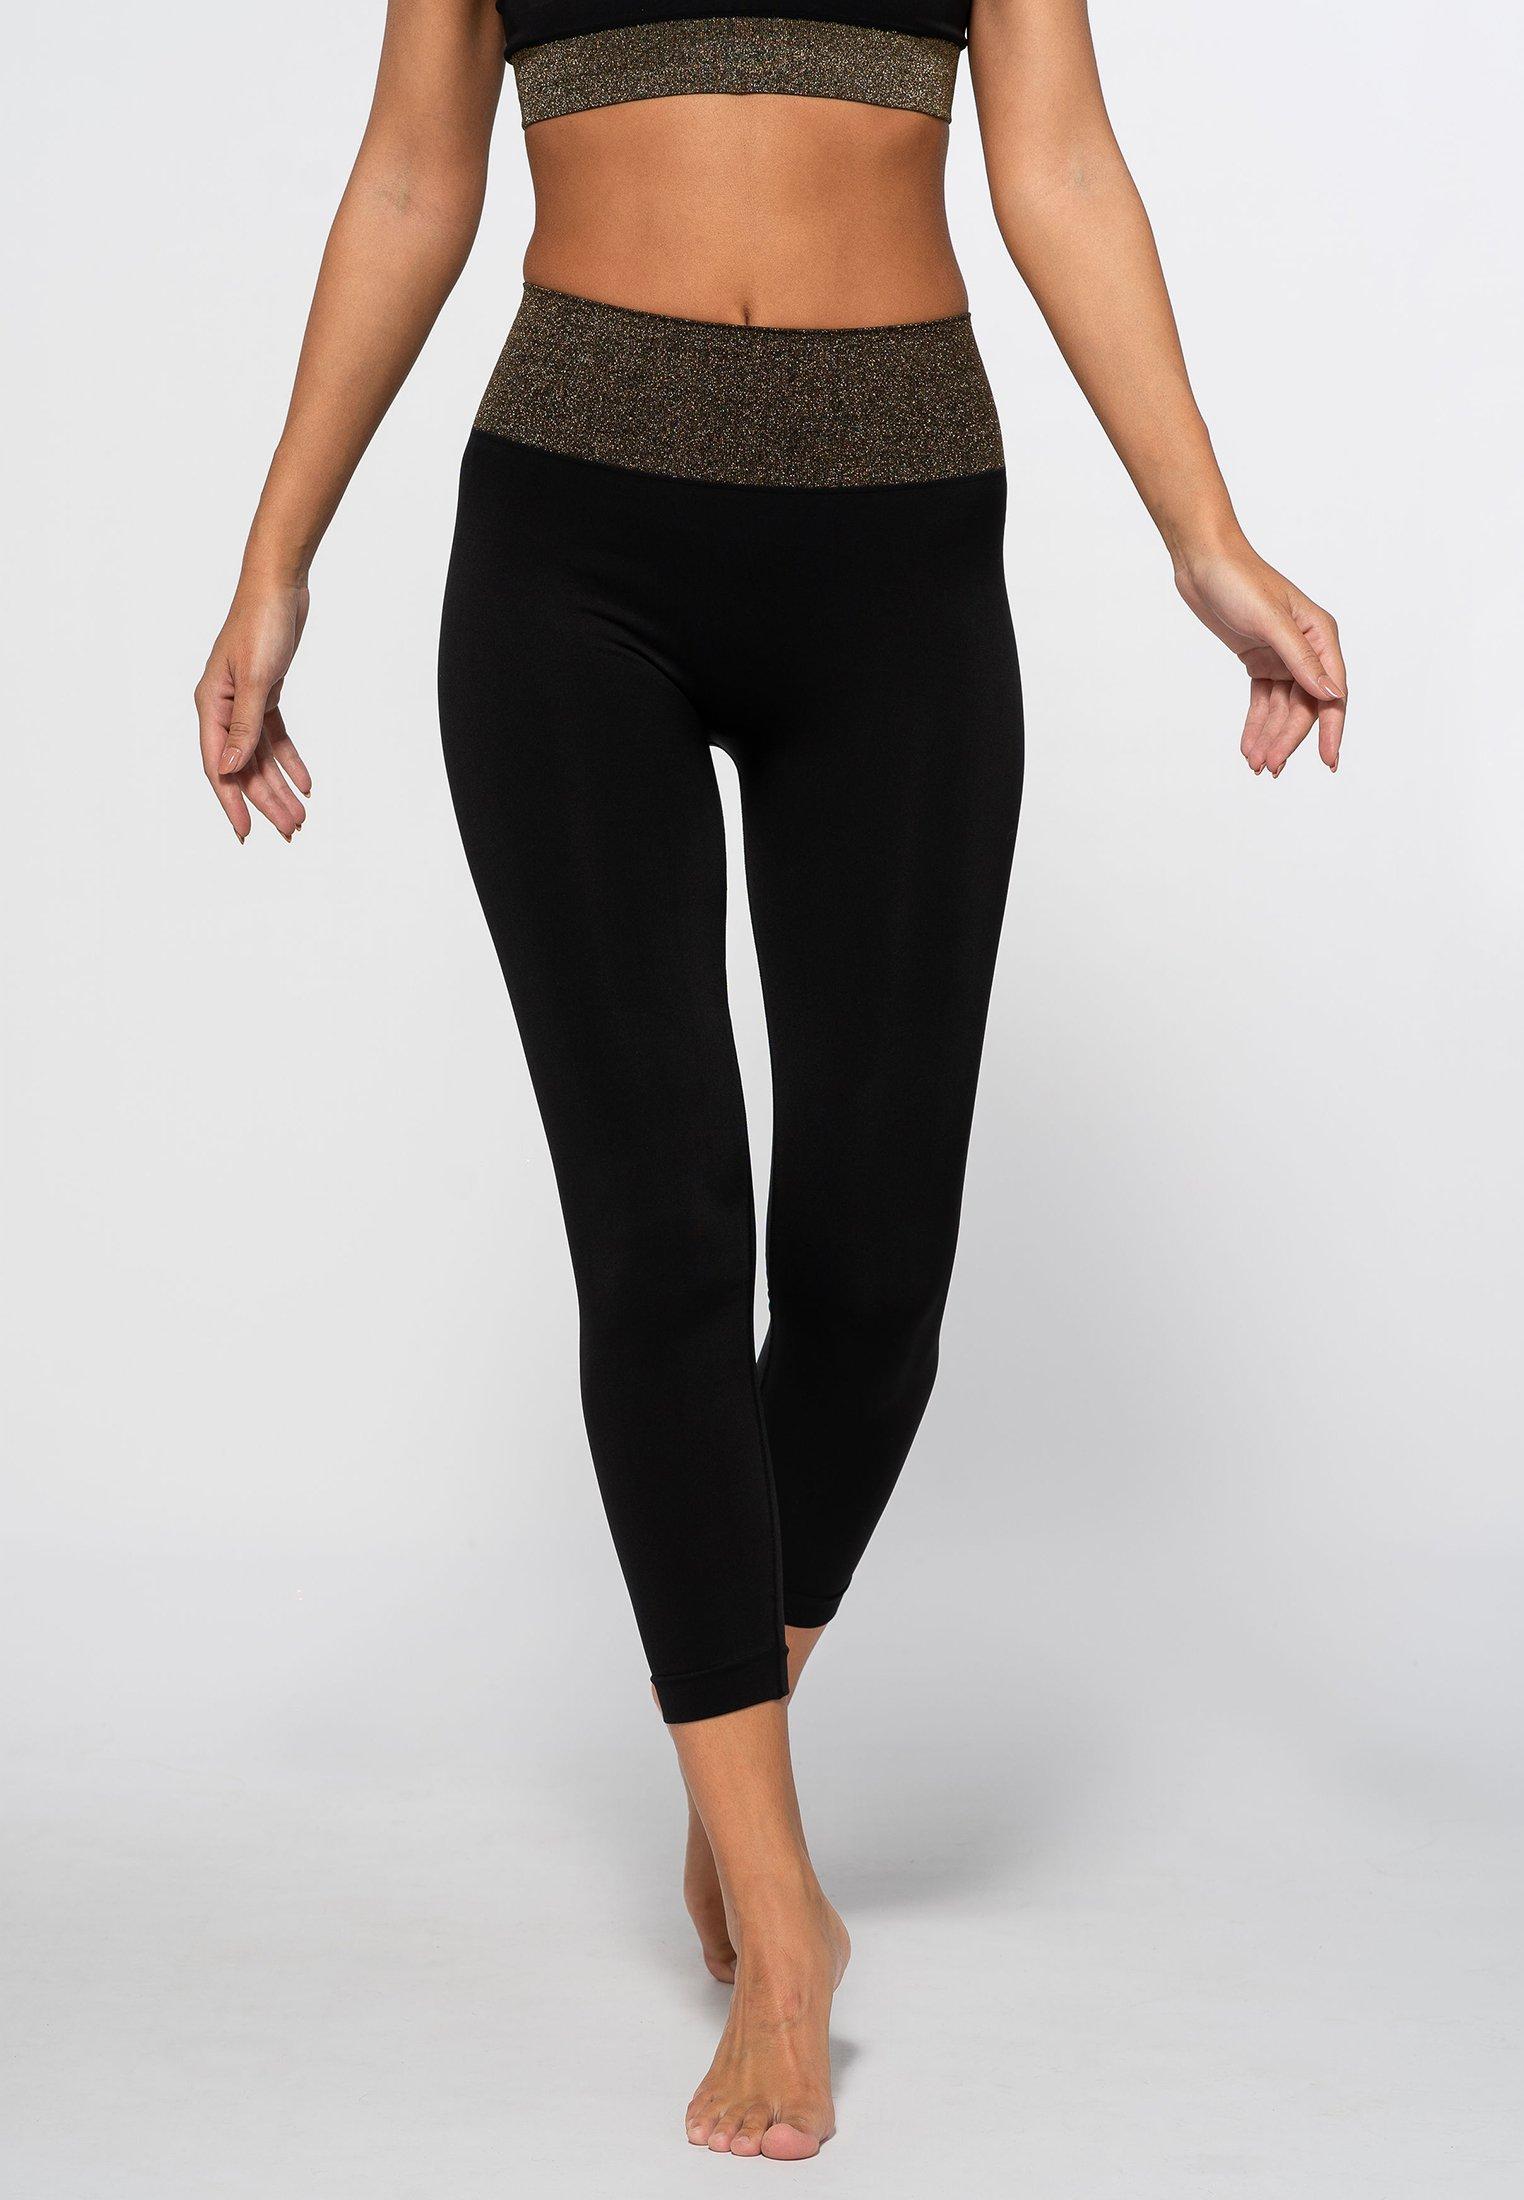 Femme HAMPTONS SEAMLESS  - Collants